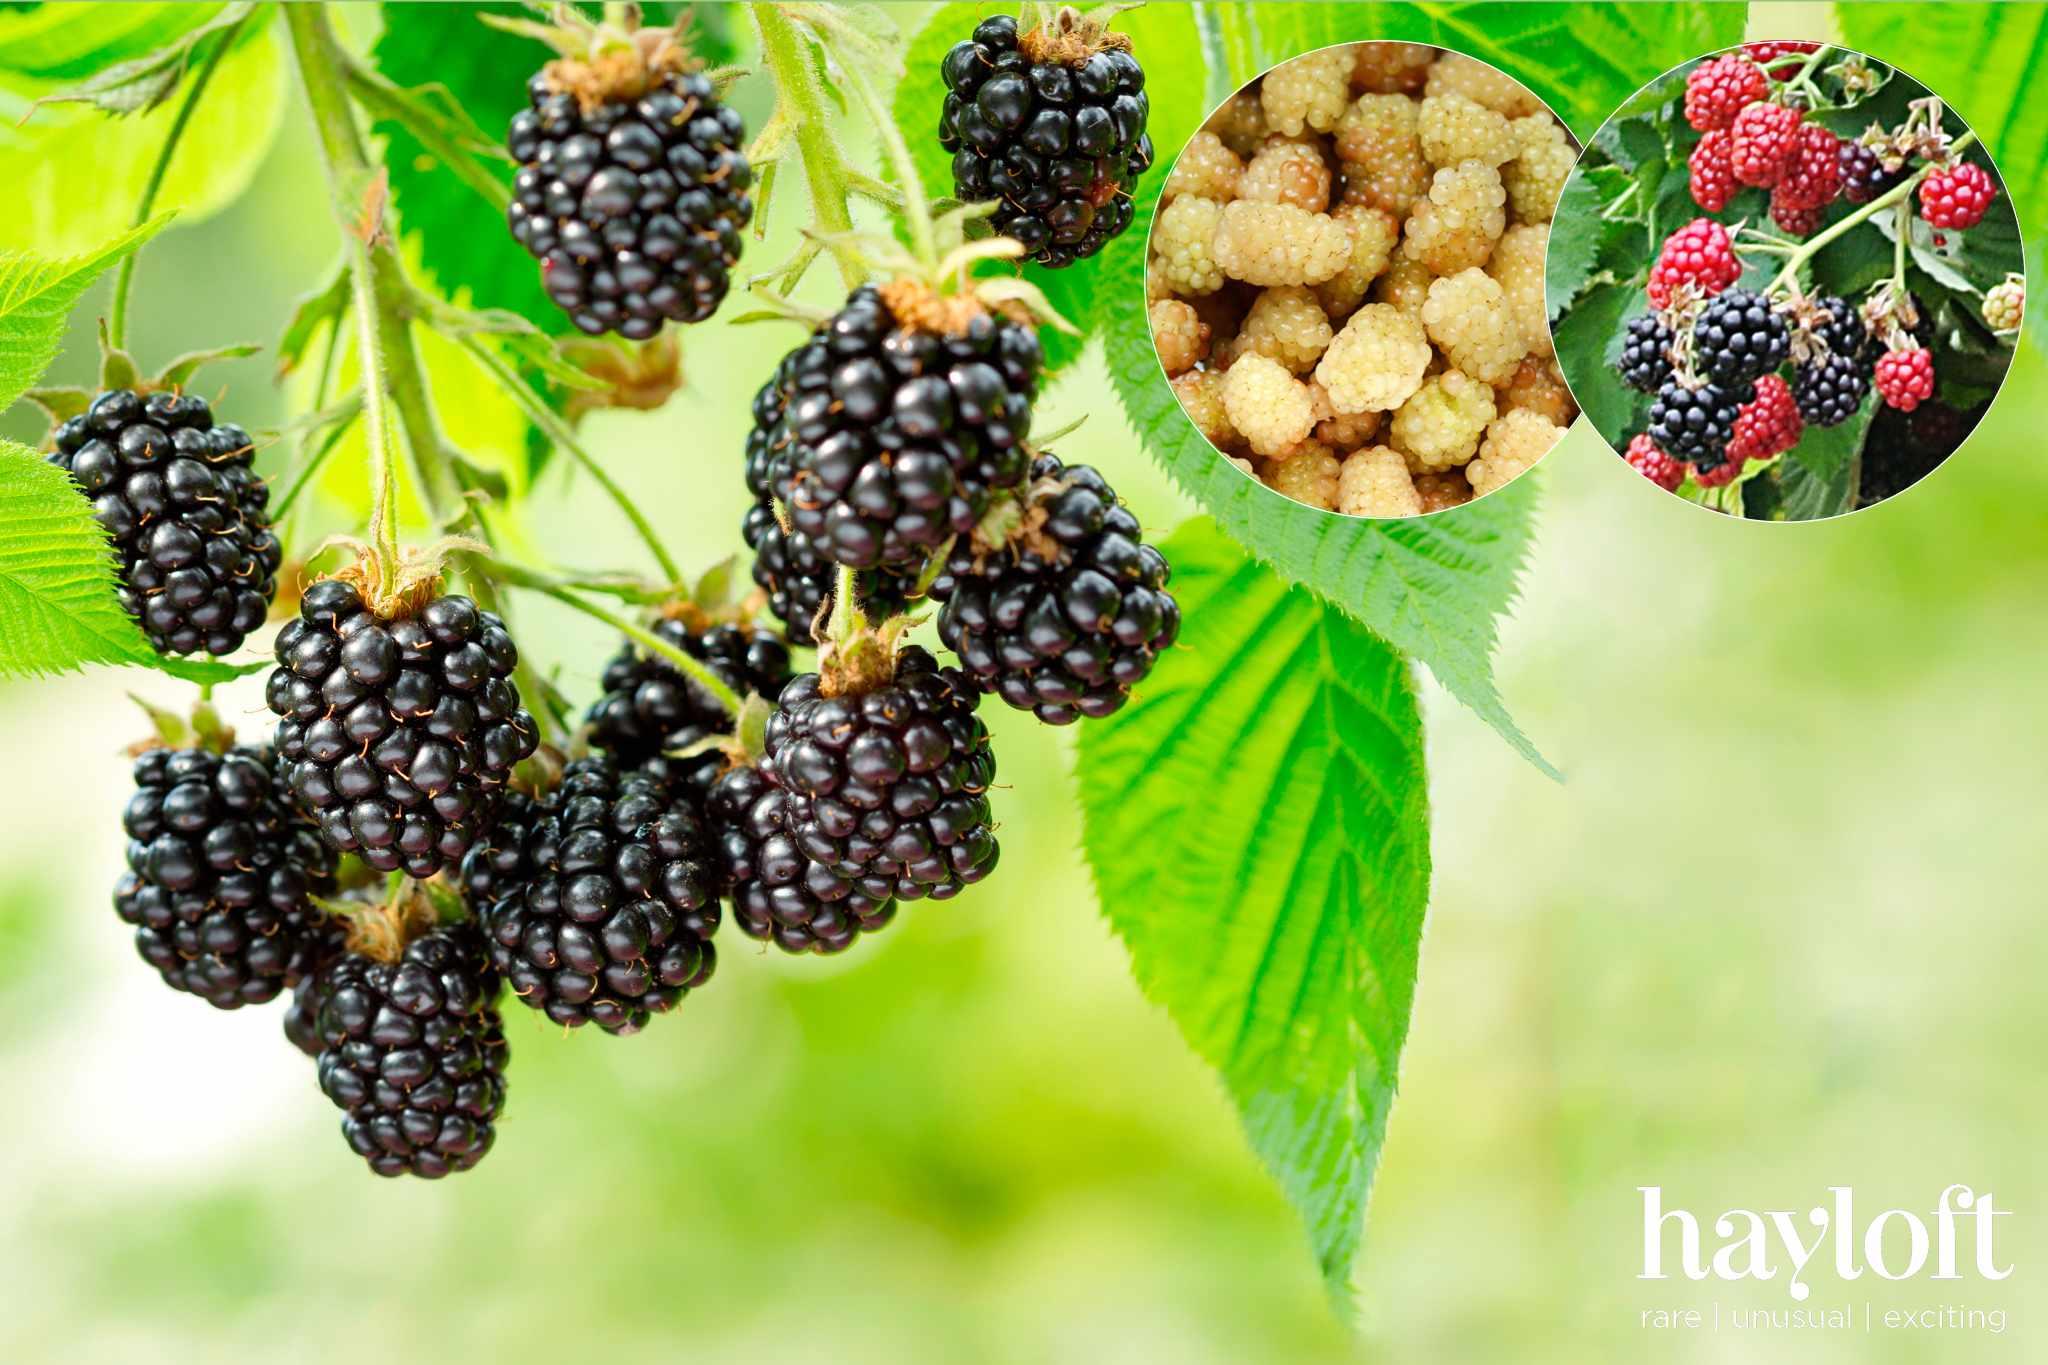 Free blackberry plants from Hayloft